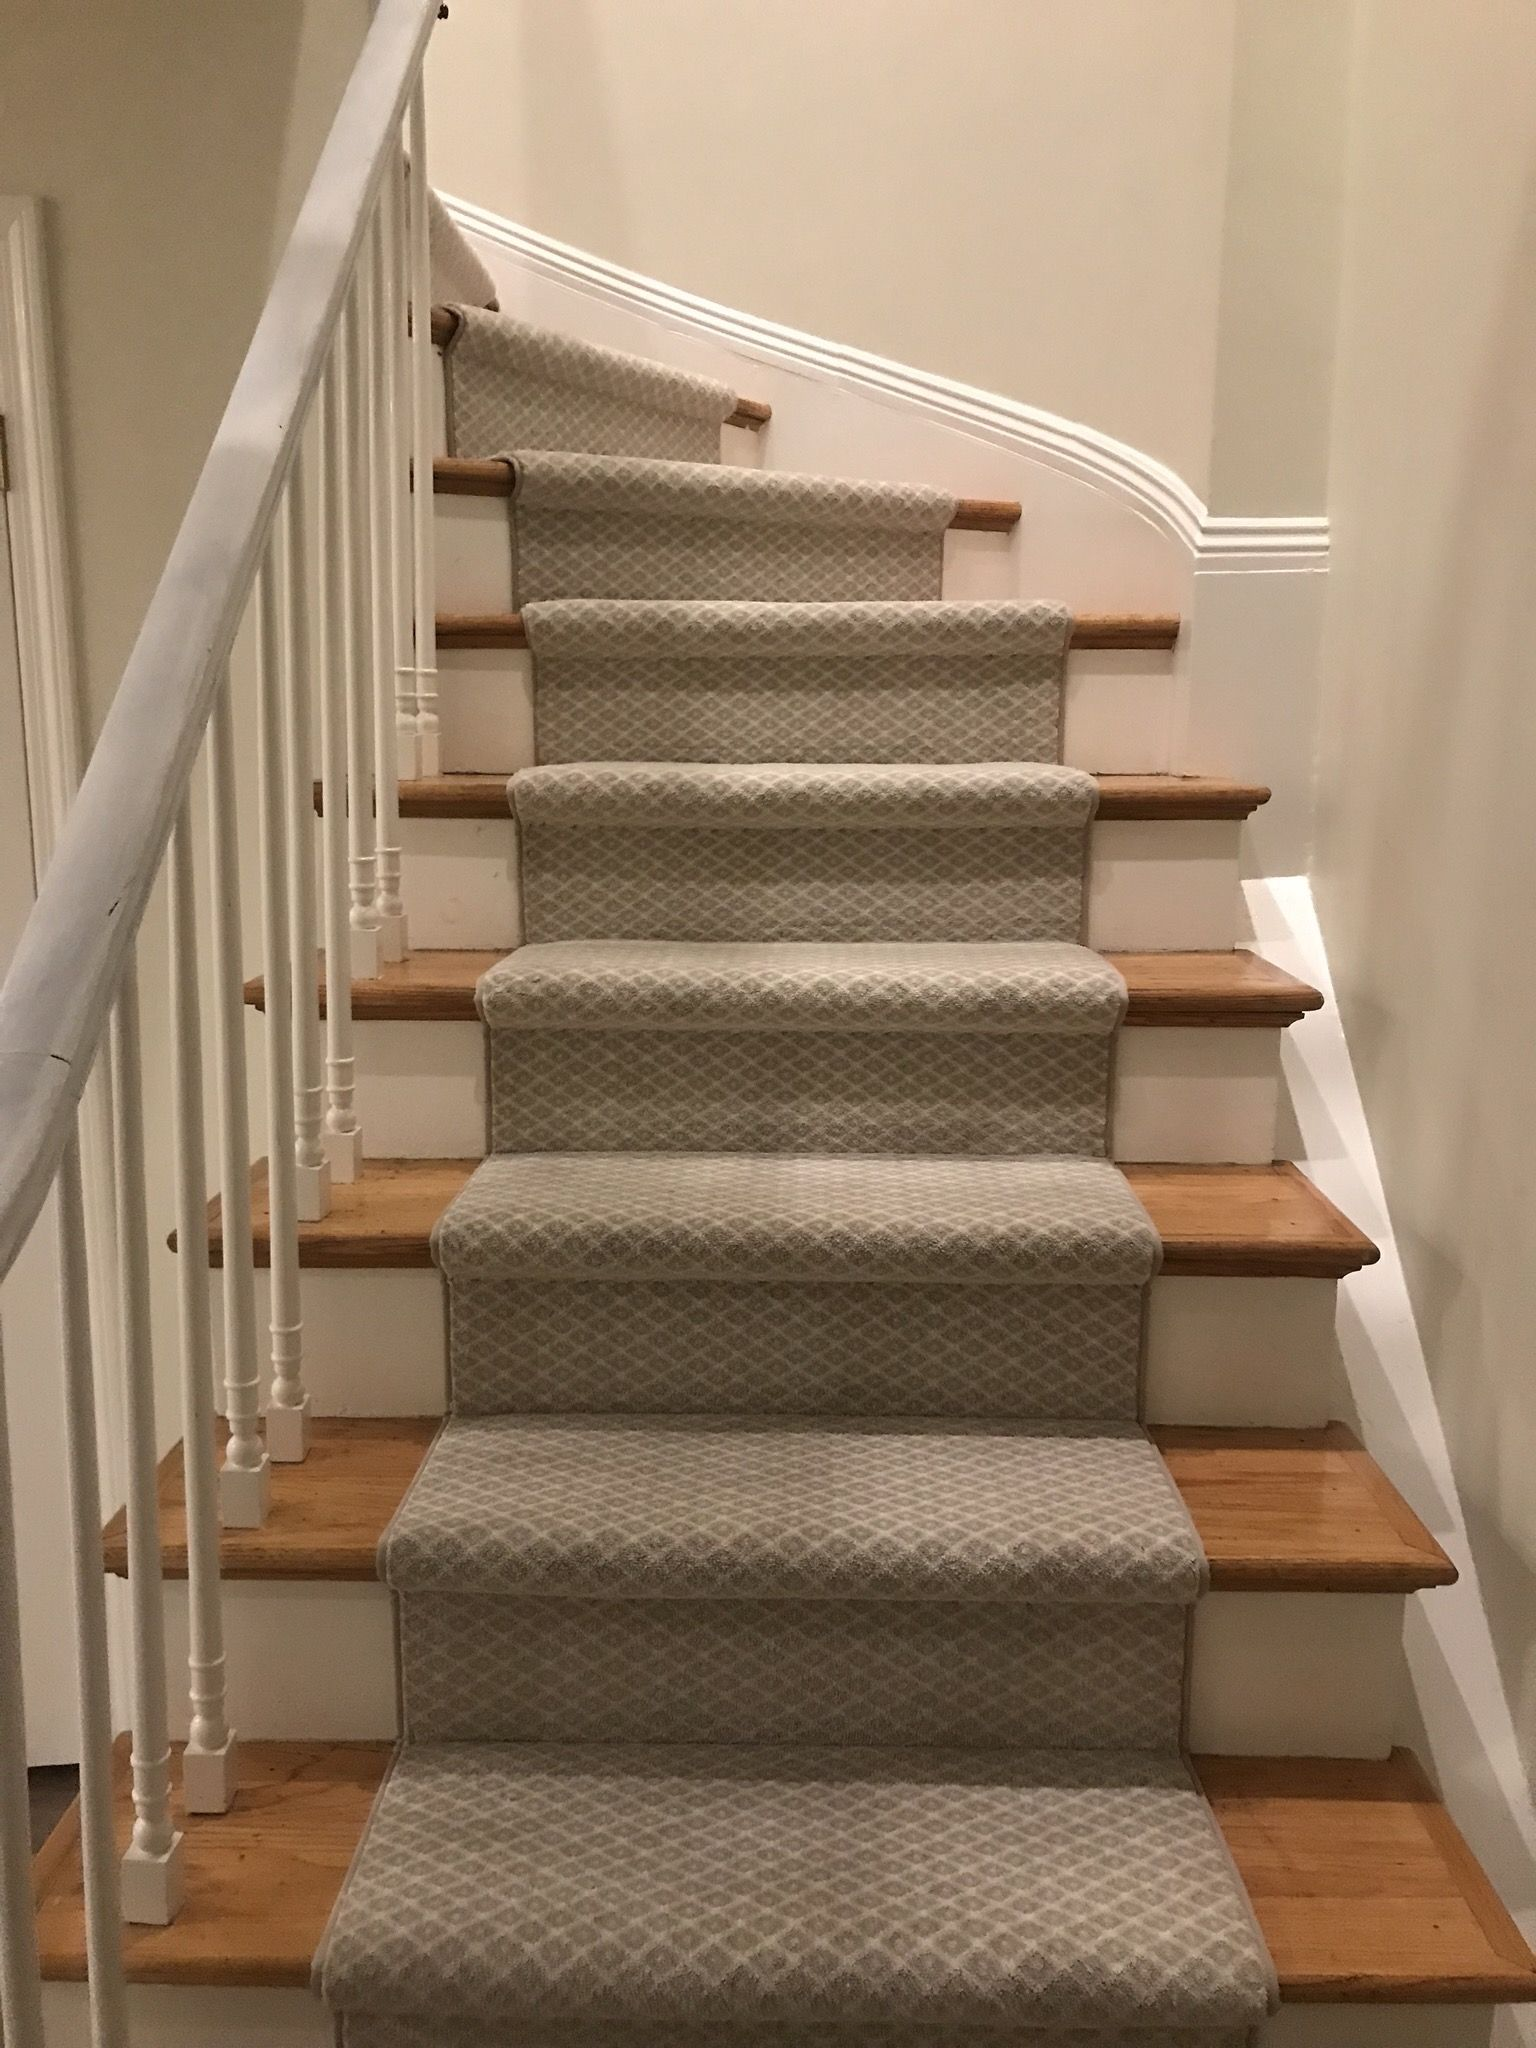 Boston Newyork Wool Plush Stair Stairrunner Runner Modern Contemporary Thecarpetworkroom Carpet F Geometric Stair Runner Stair Runner Landing Decor